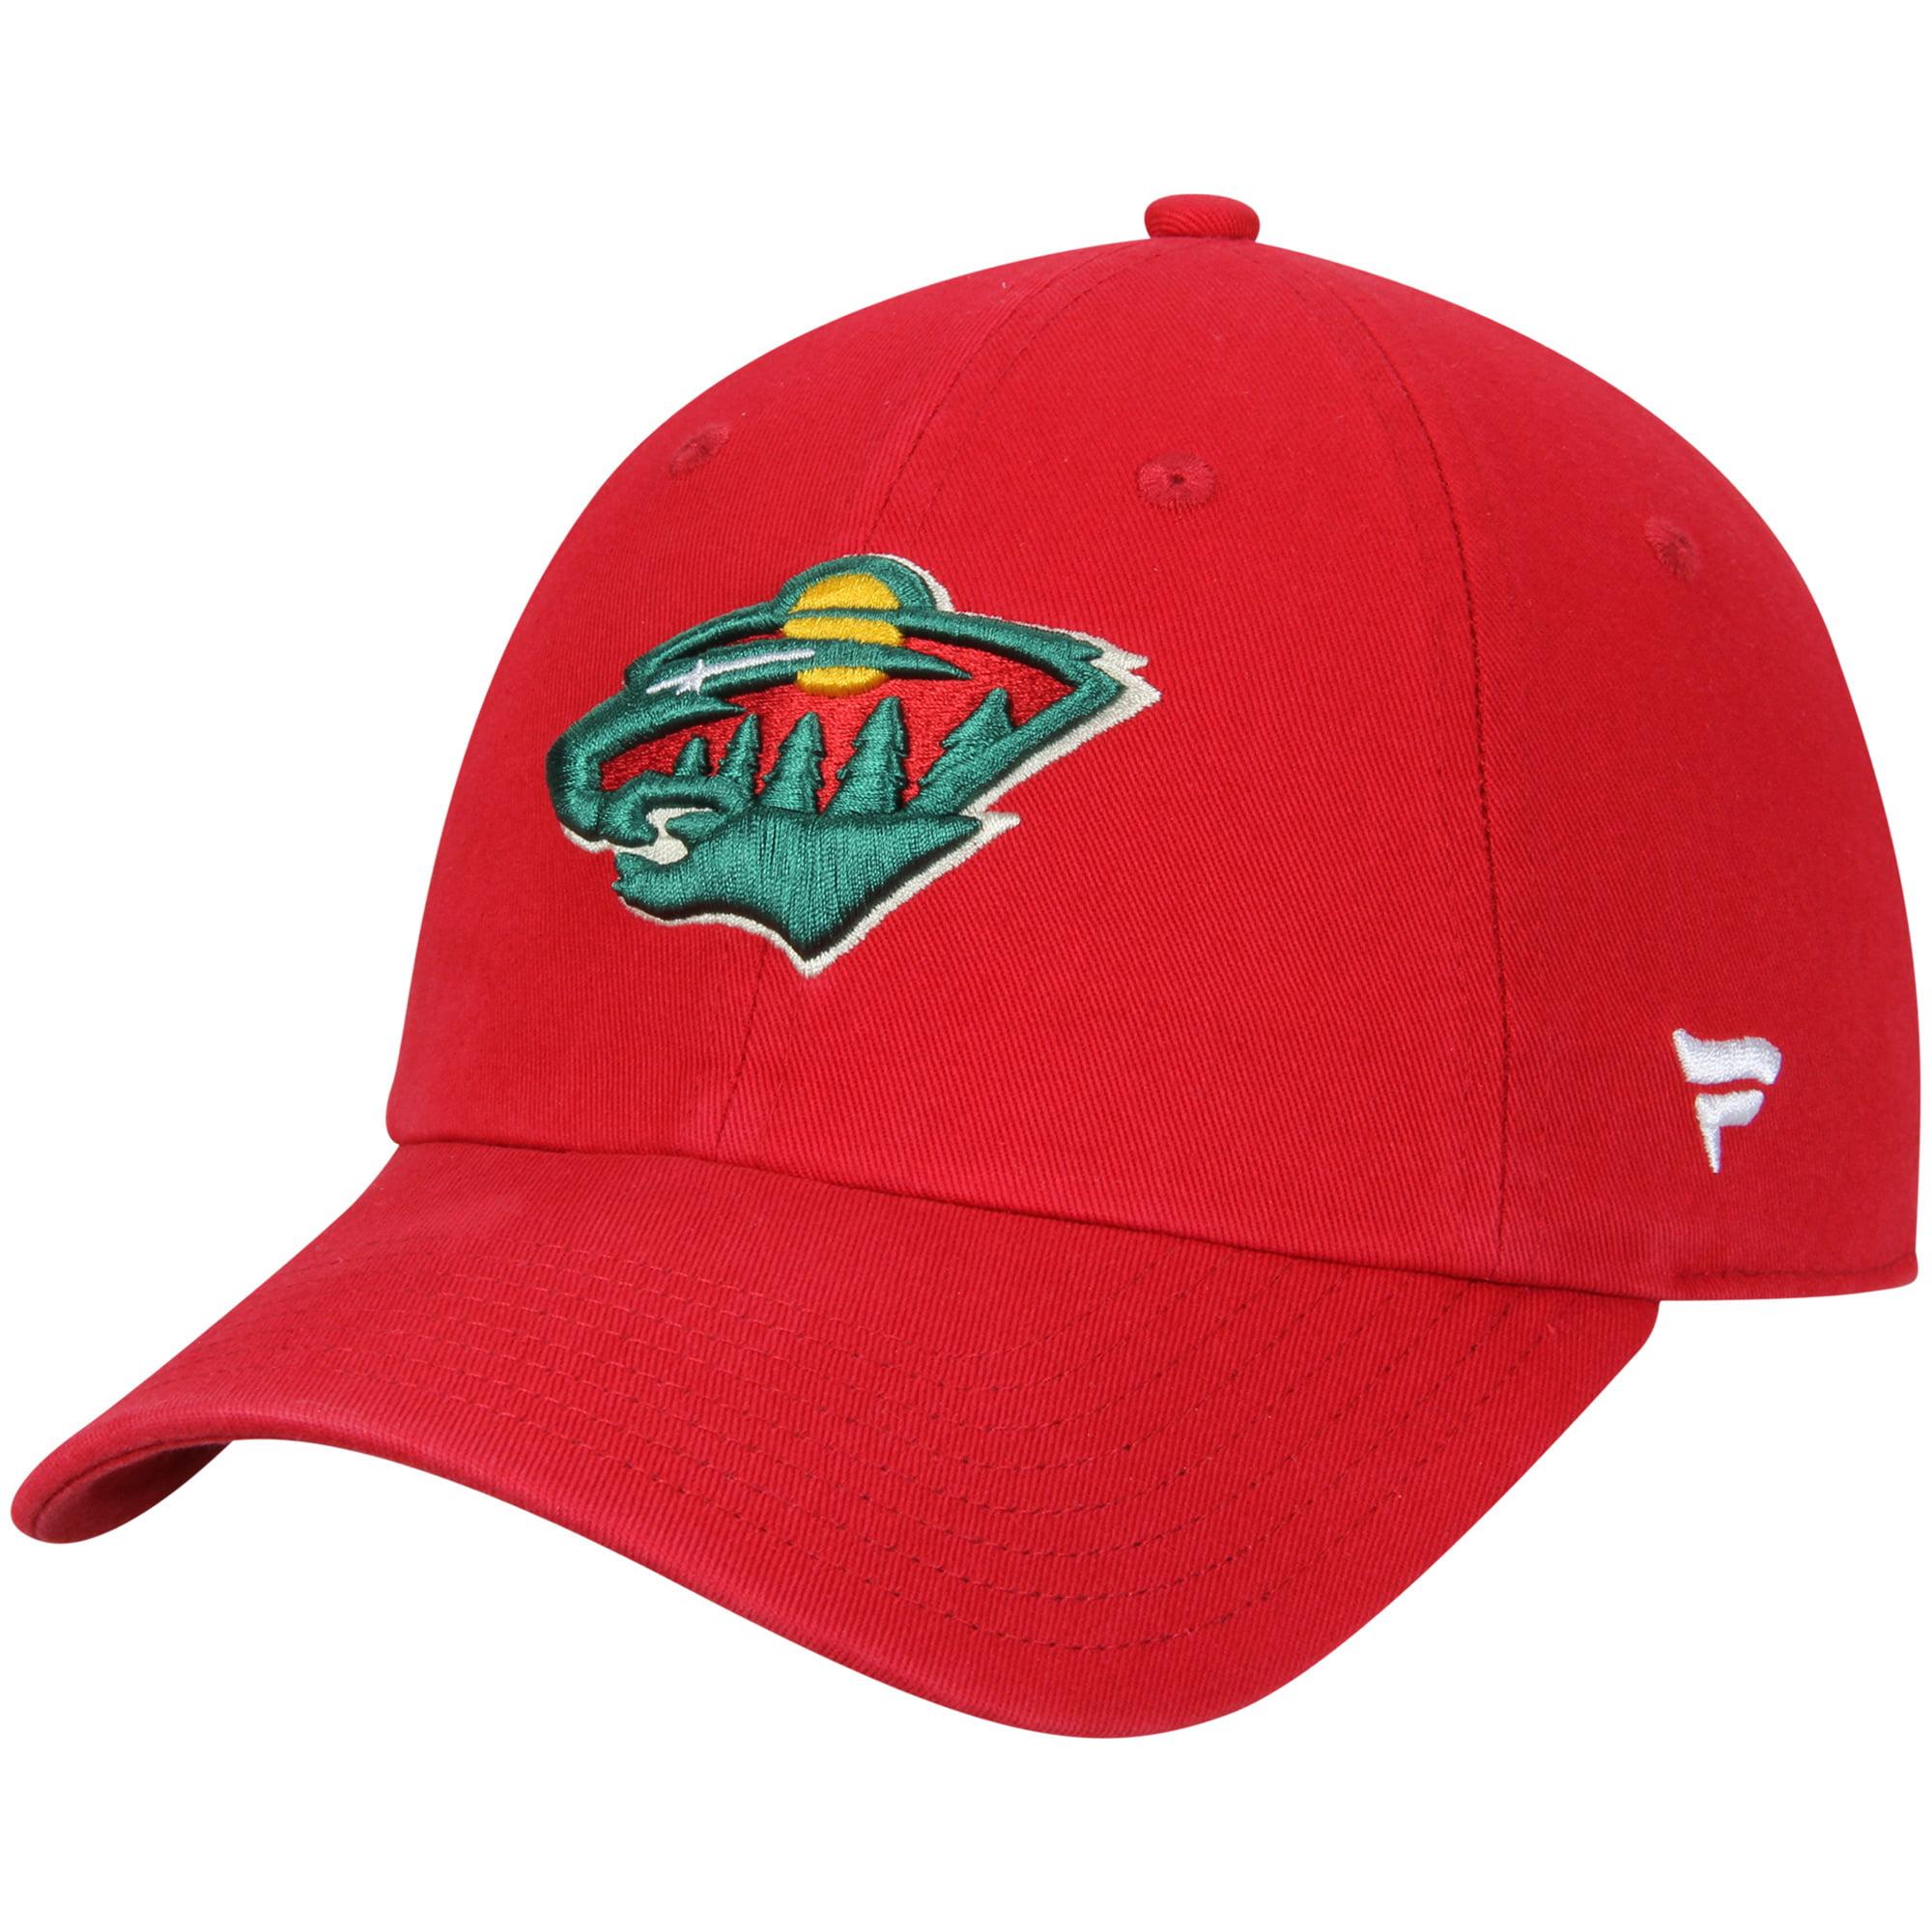 Minnesota Wild Fanatics Branded Youth Fundamental Adjustable Hat - Red - OSFA